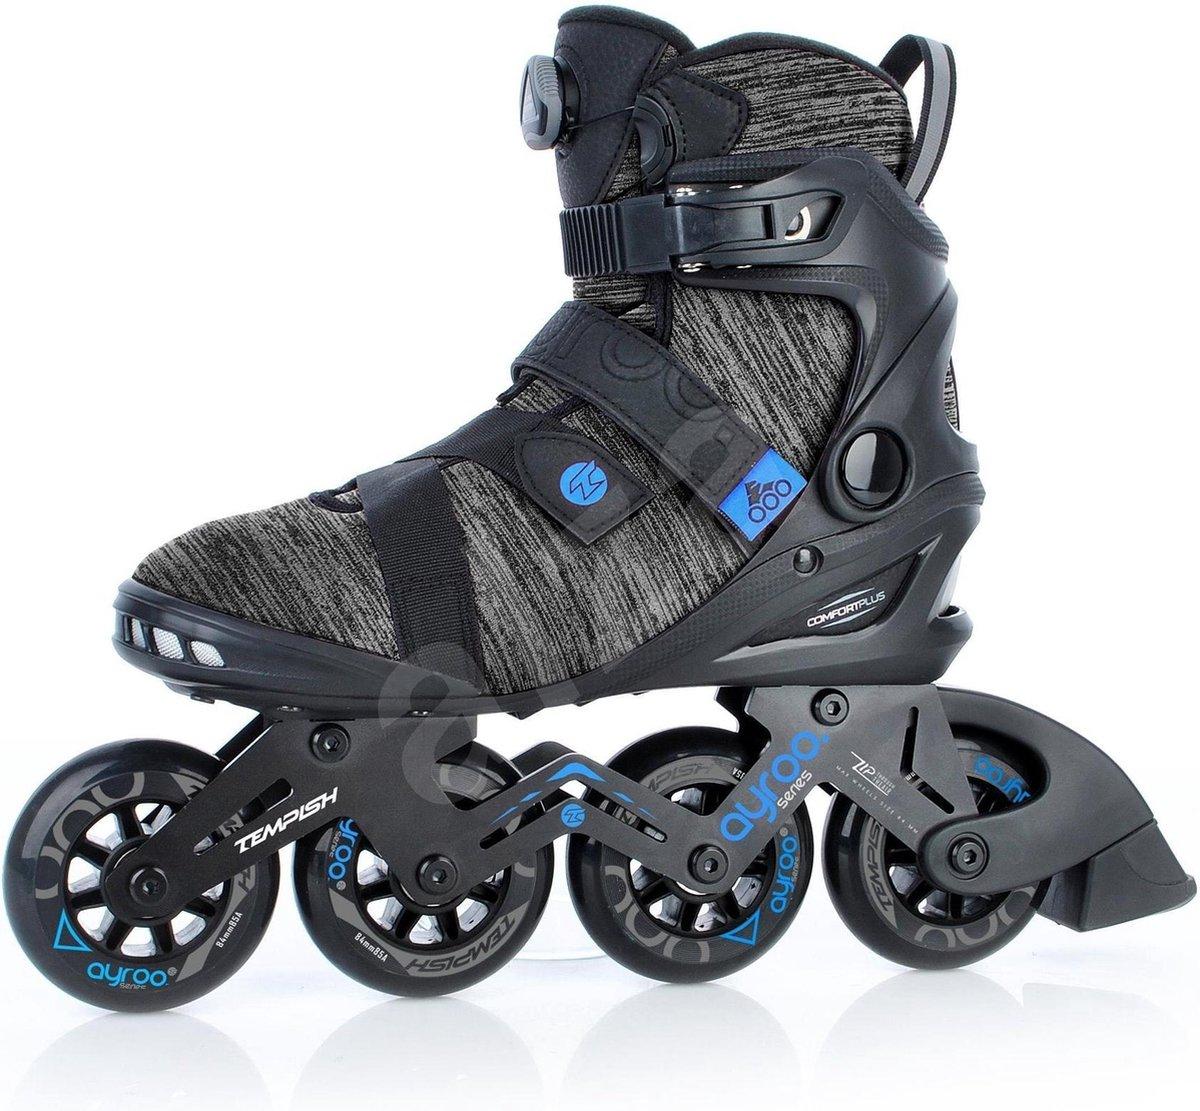 Tempish Inline Skate Ayroo Top 84 - Zwart-blauw - Maat 43